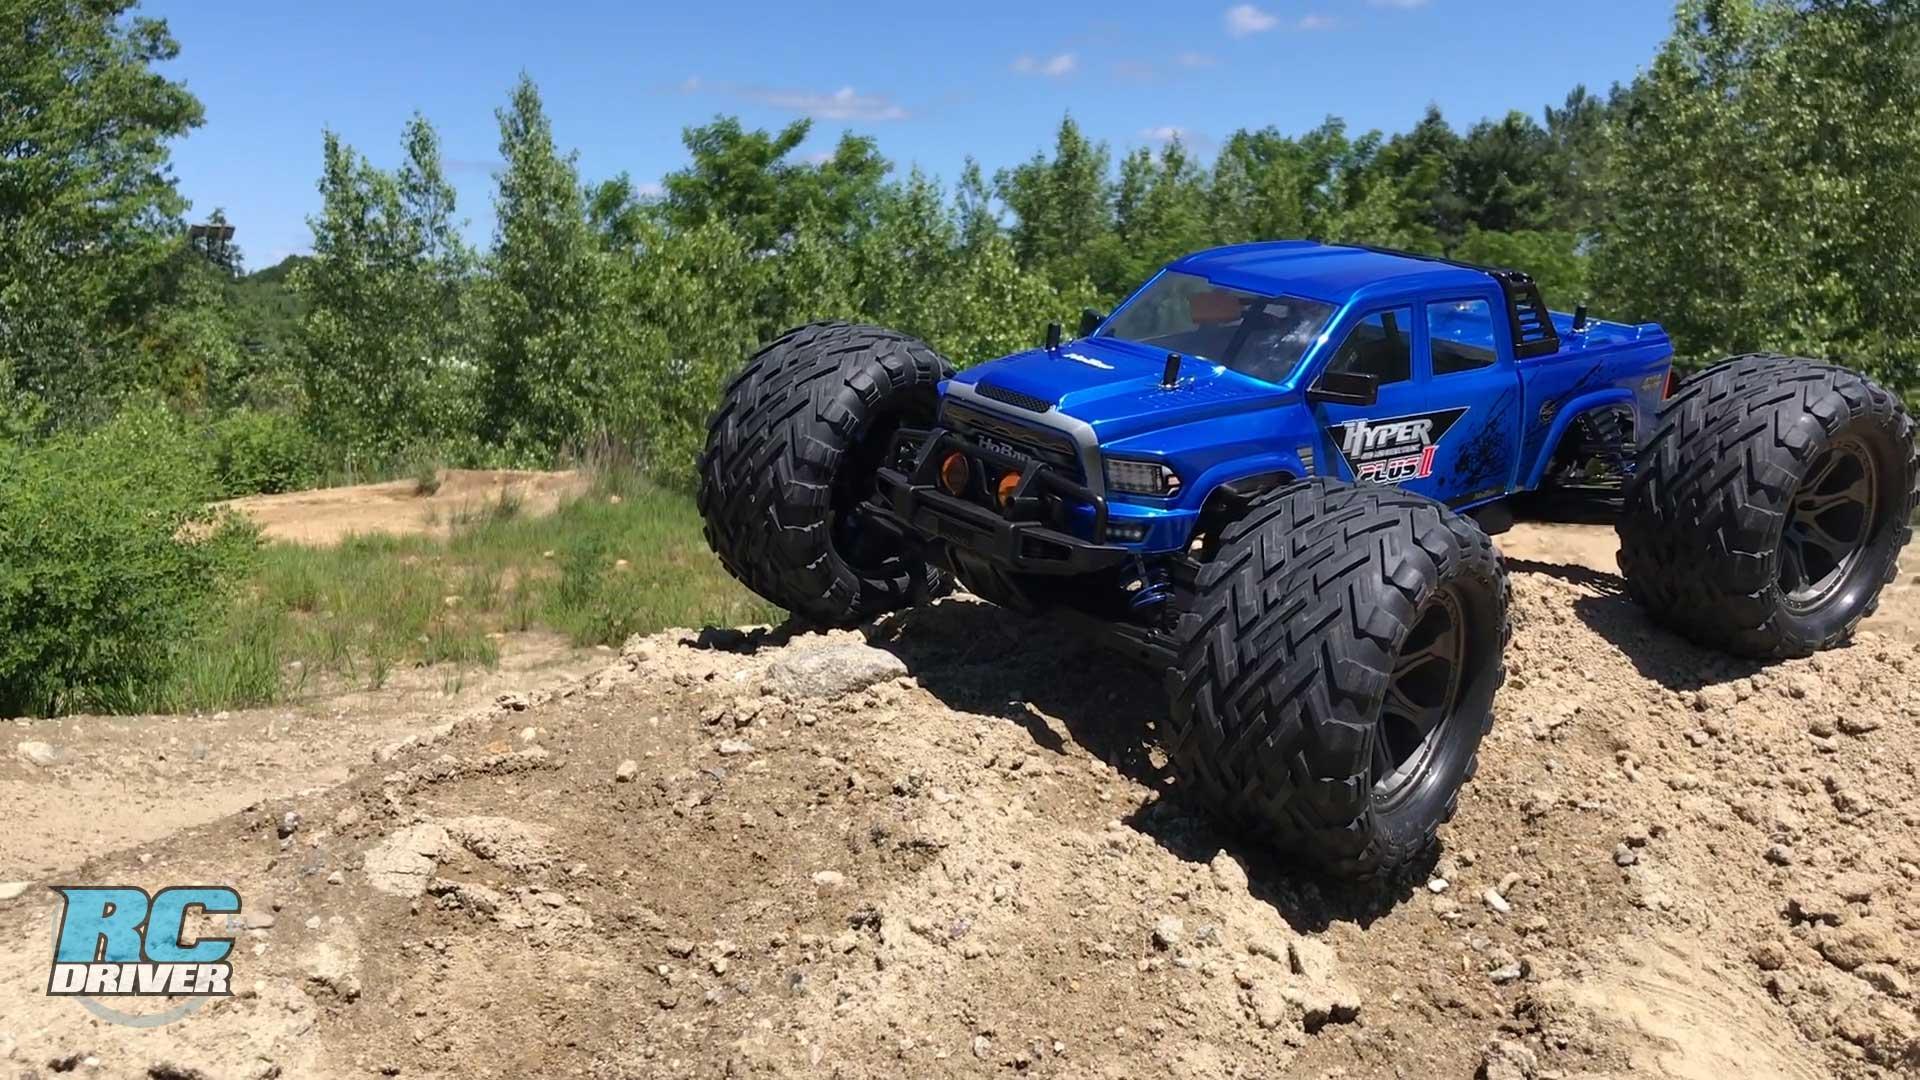 HoBao Racing Hyper MT Plus II RTR BL Monster Truck Review